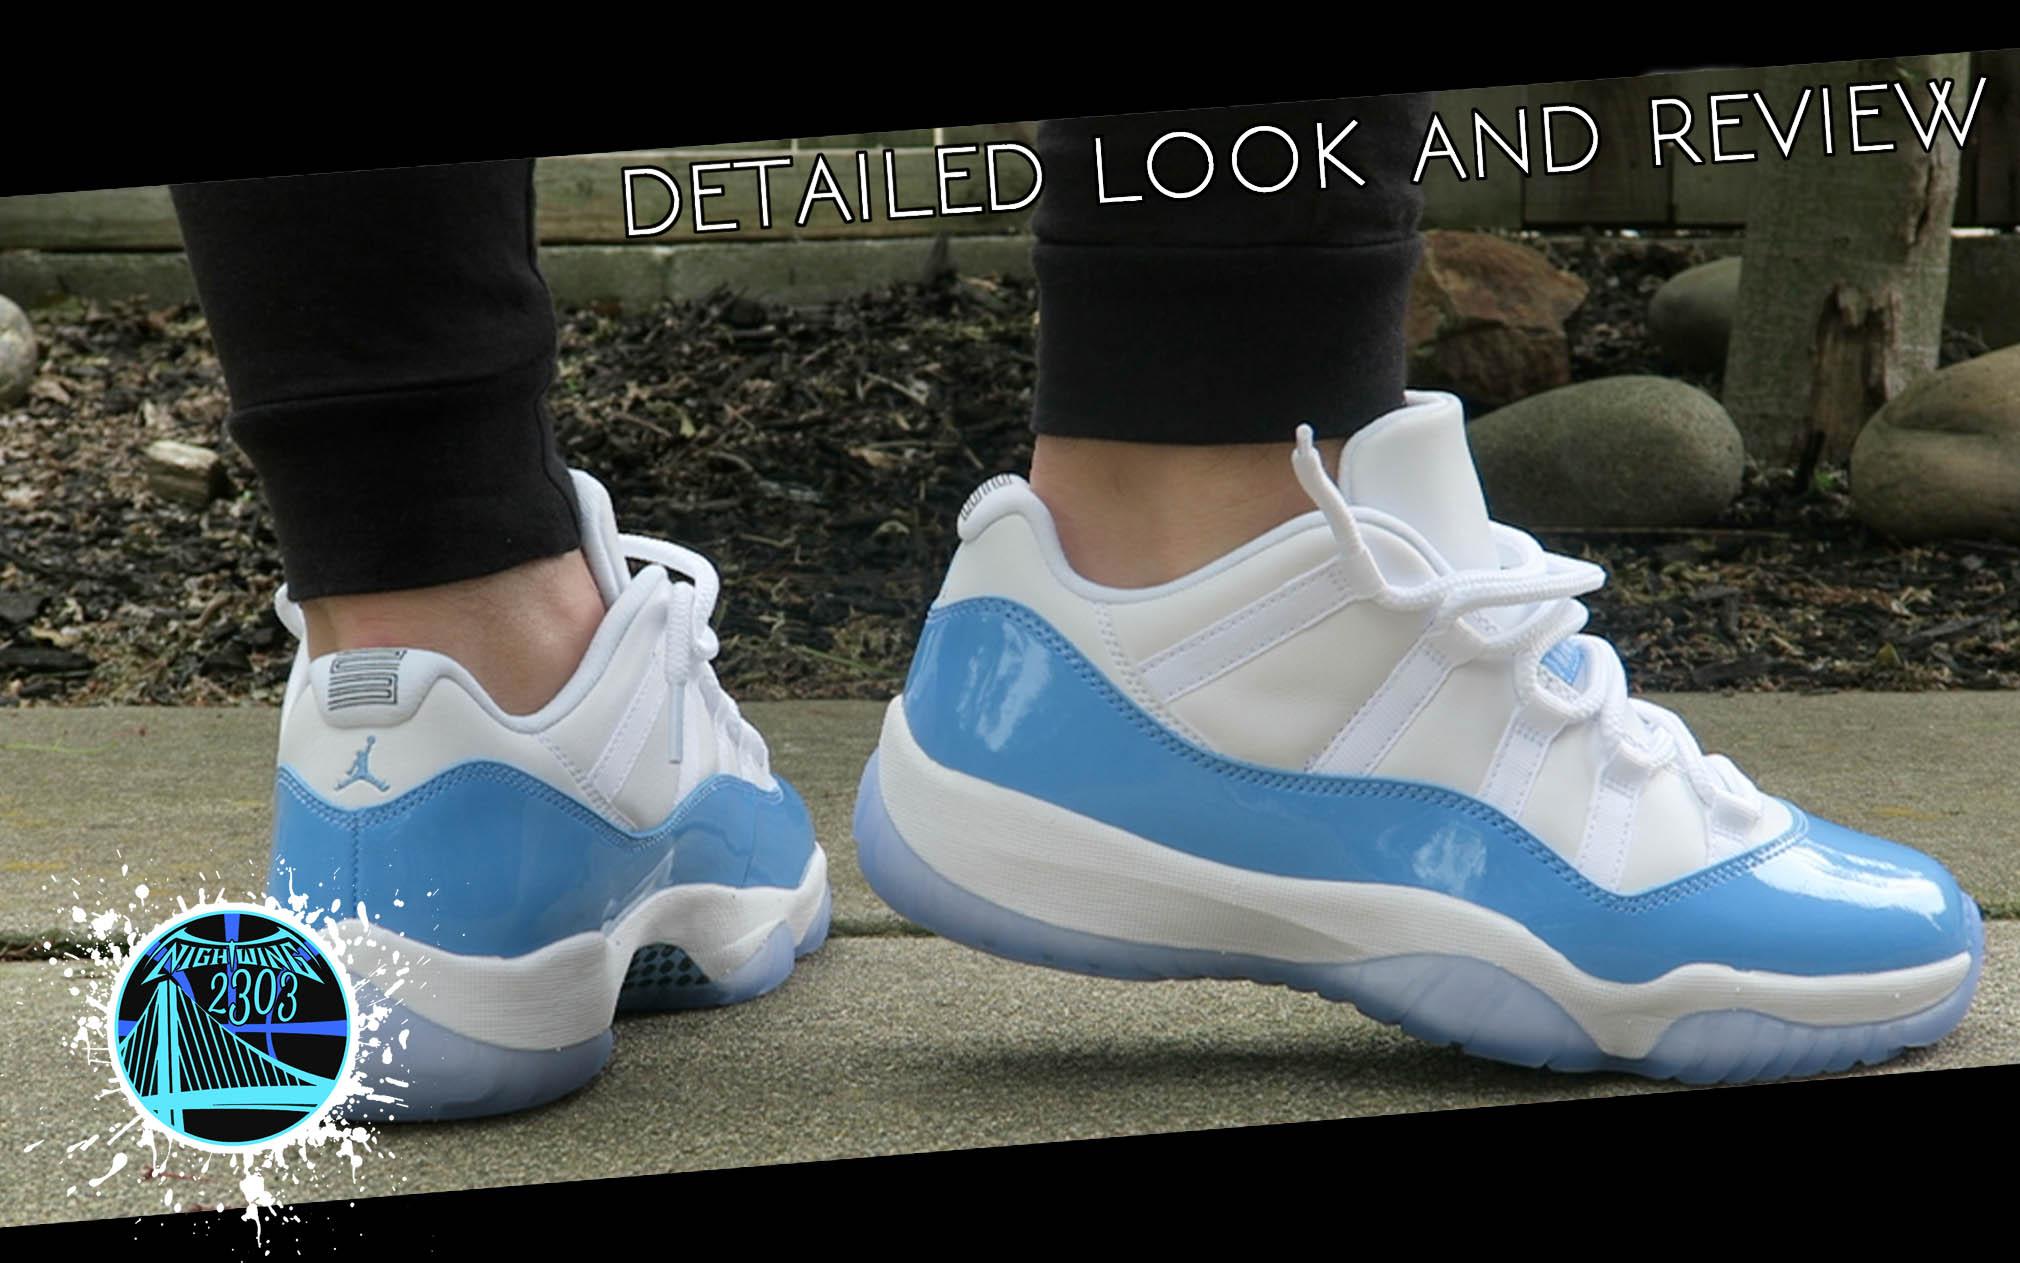 huge discount 8fd7f 0d5e3 Air Jordan 11 Retro Low 'University Blue' | Detailed Look ...